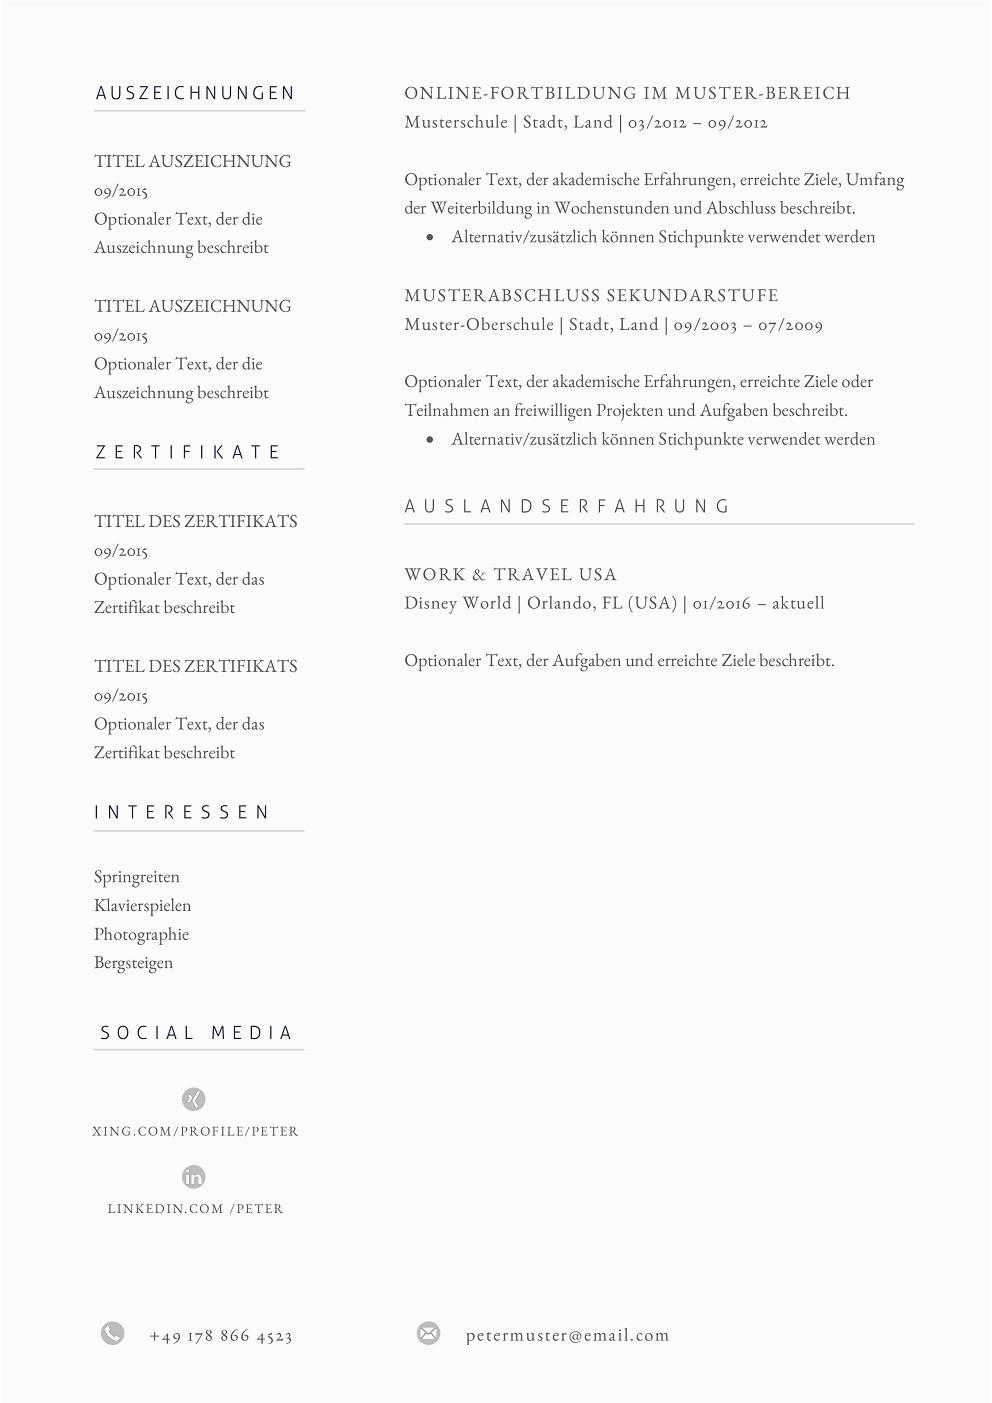 Lebenslauf Muster Design 11 Premium Bewerbungsmuster 11